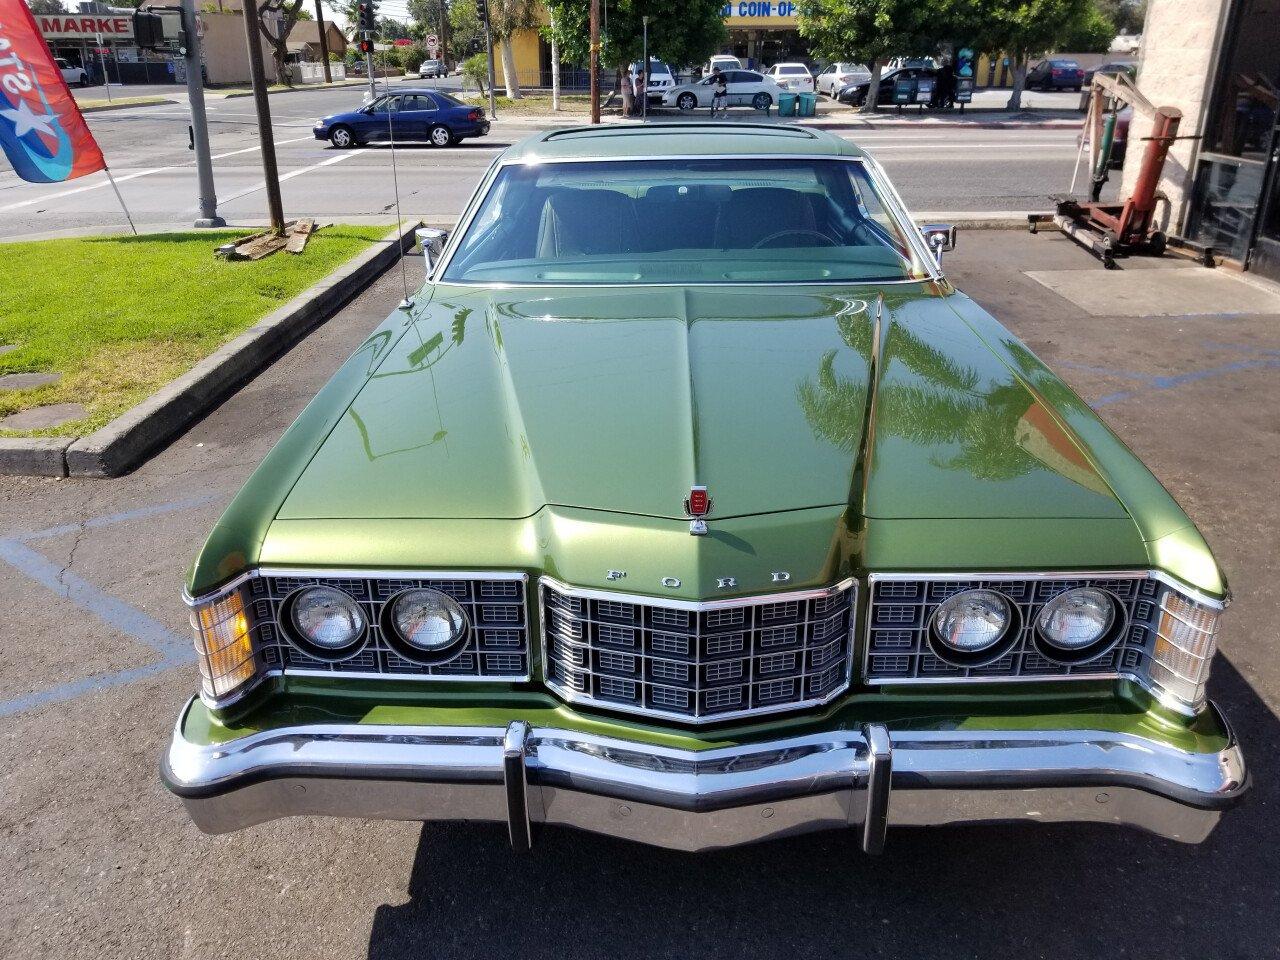 1972 Ford Ltd For Sale >> 1973 Ford LTD for sale near Santa Ana, California 92705 - Classics on Autotrader